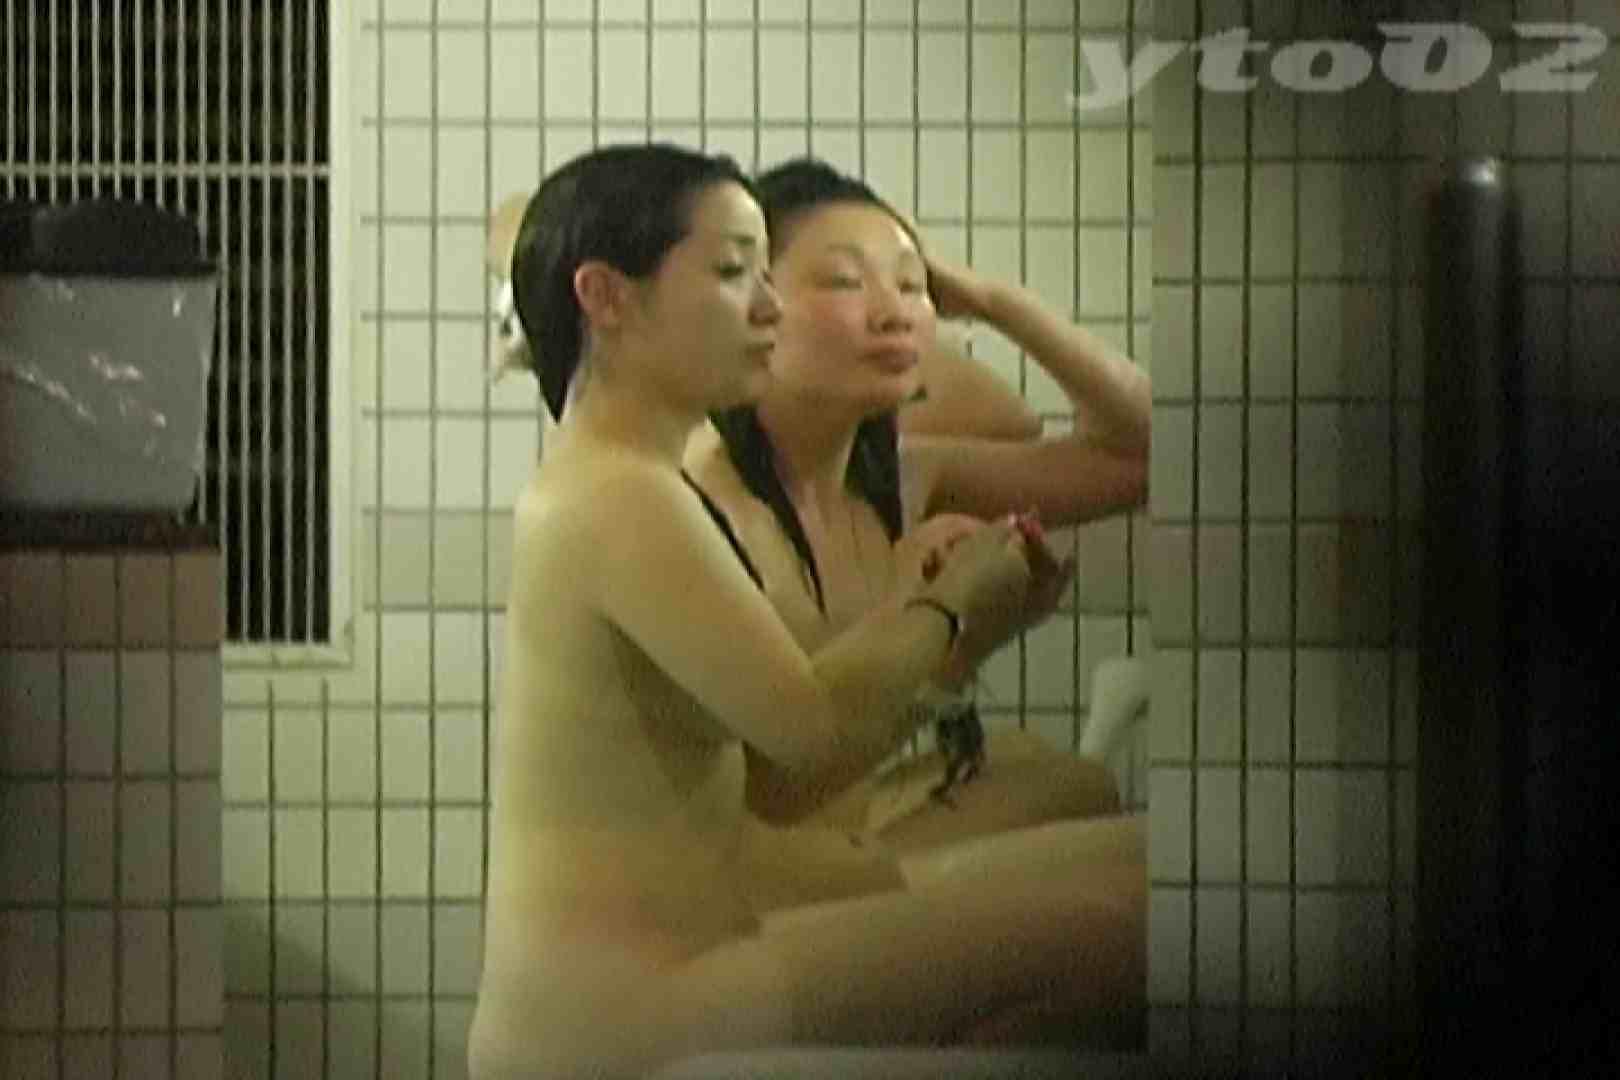 ▲復活限定▲合宿ホテル女風呂盗撮 Vol.12 合宿 | OL  26連発 26